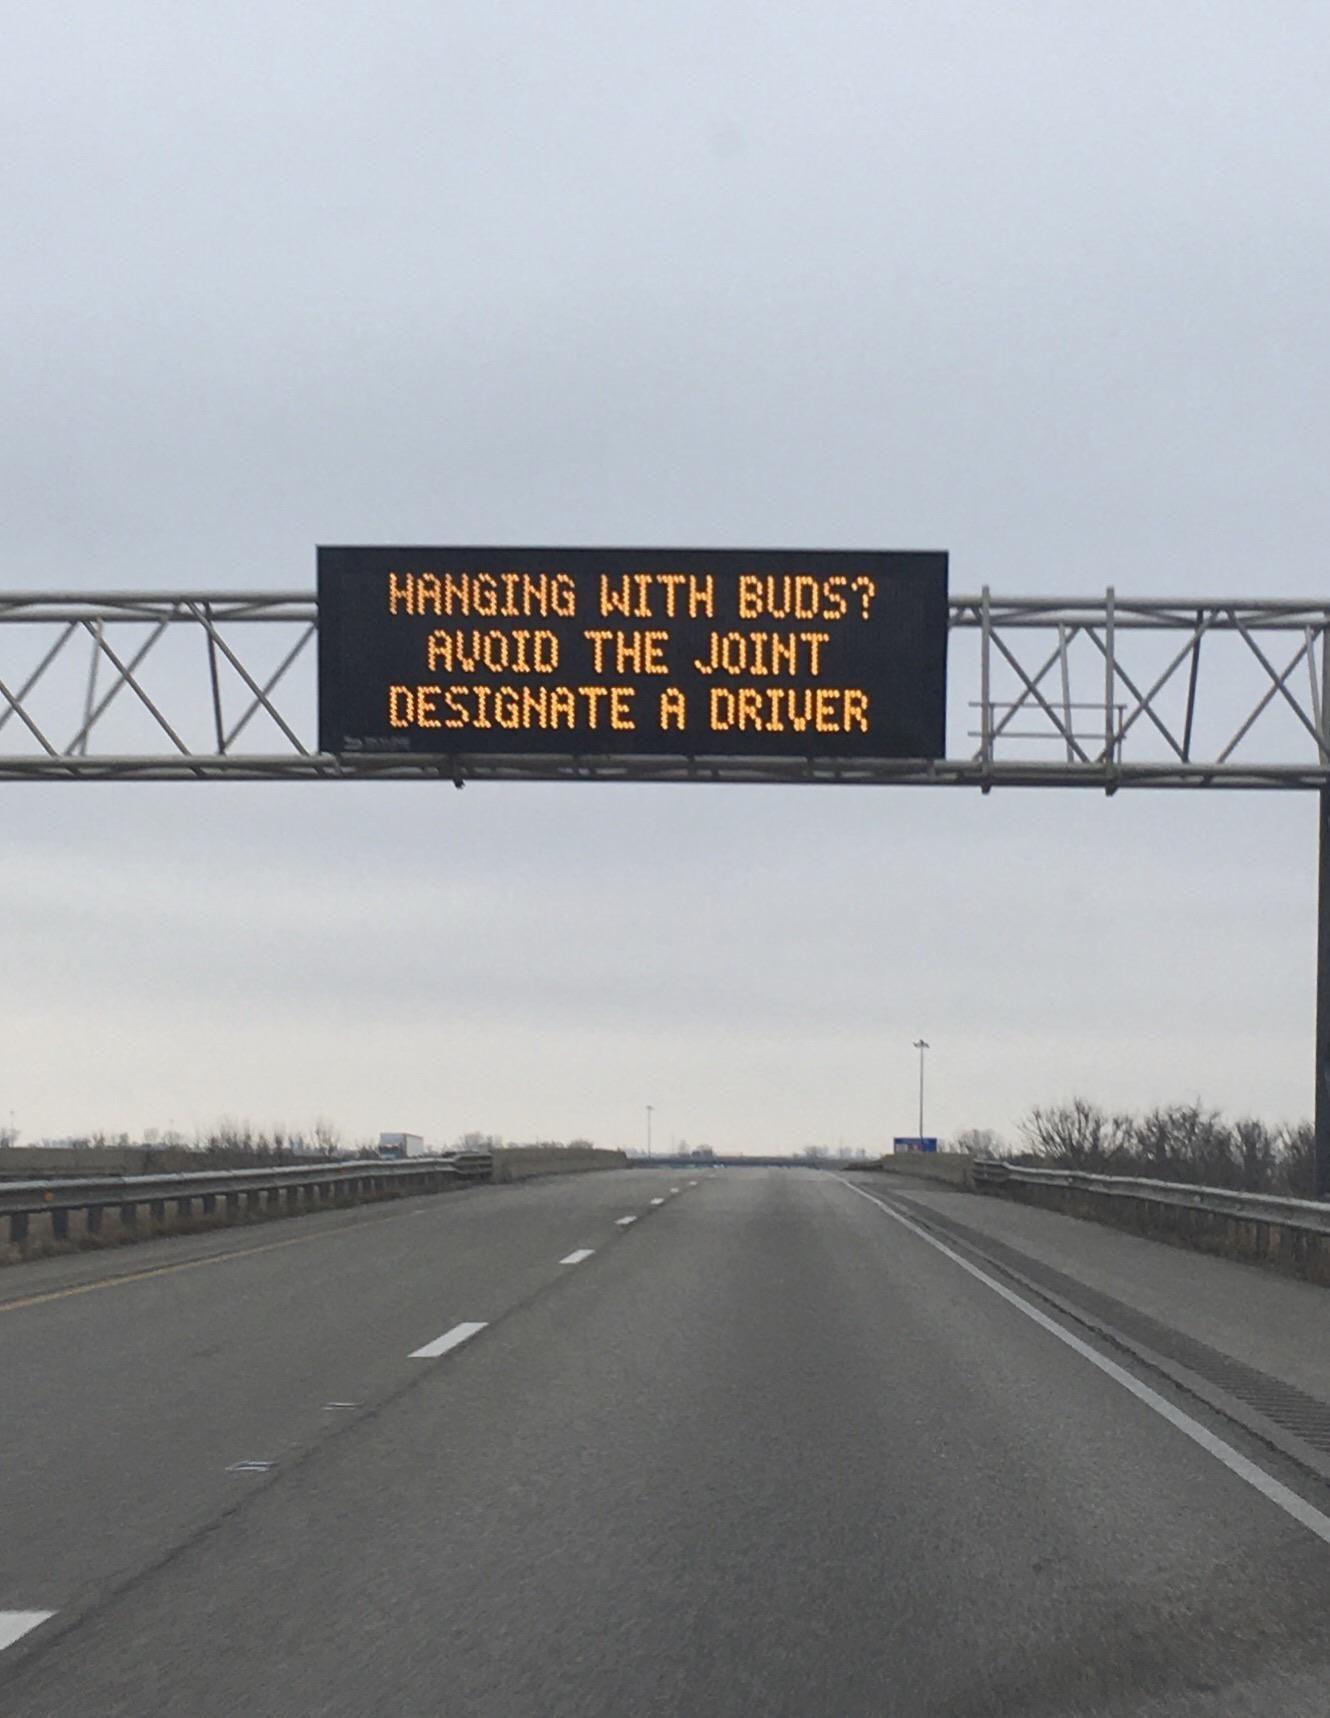 Legal marijuana puns, courtesy of the Illinois Dept of Transportation